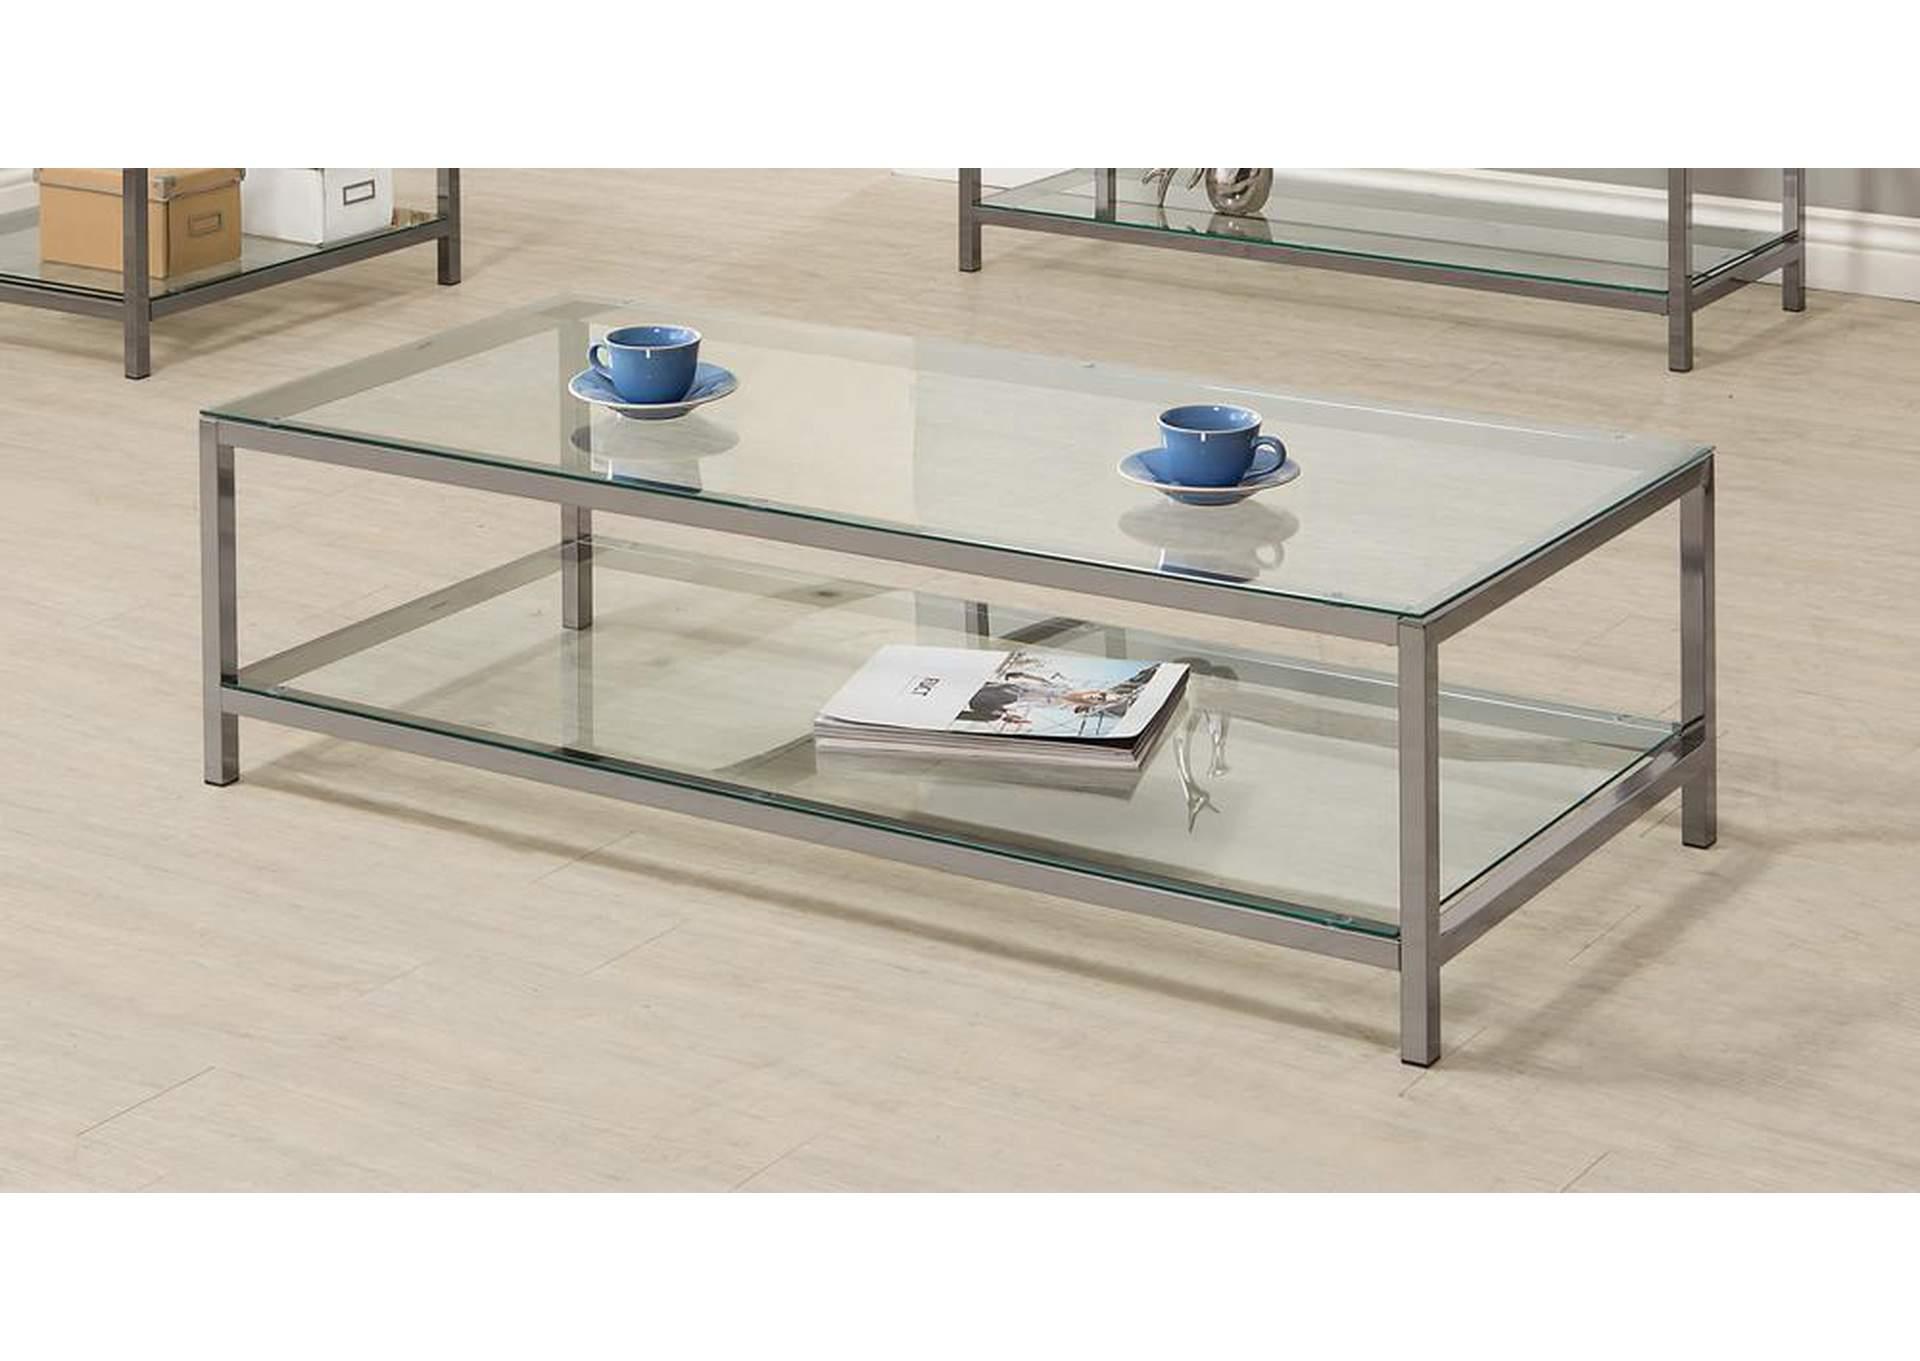 Atlantic Bedding And Furniture Black Nickel Coffee Table